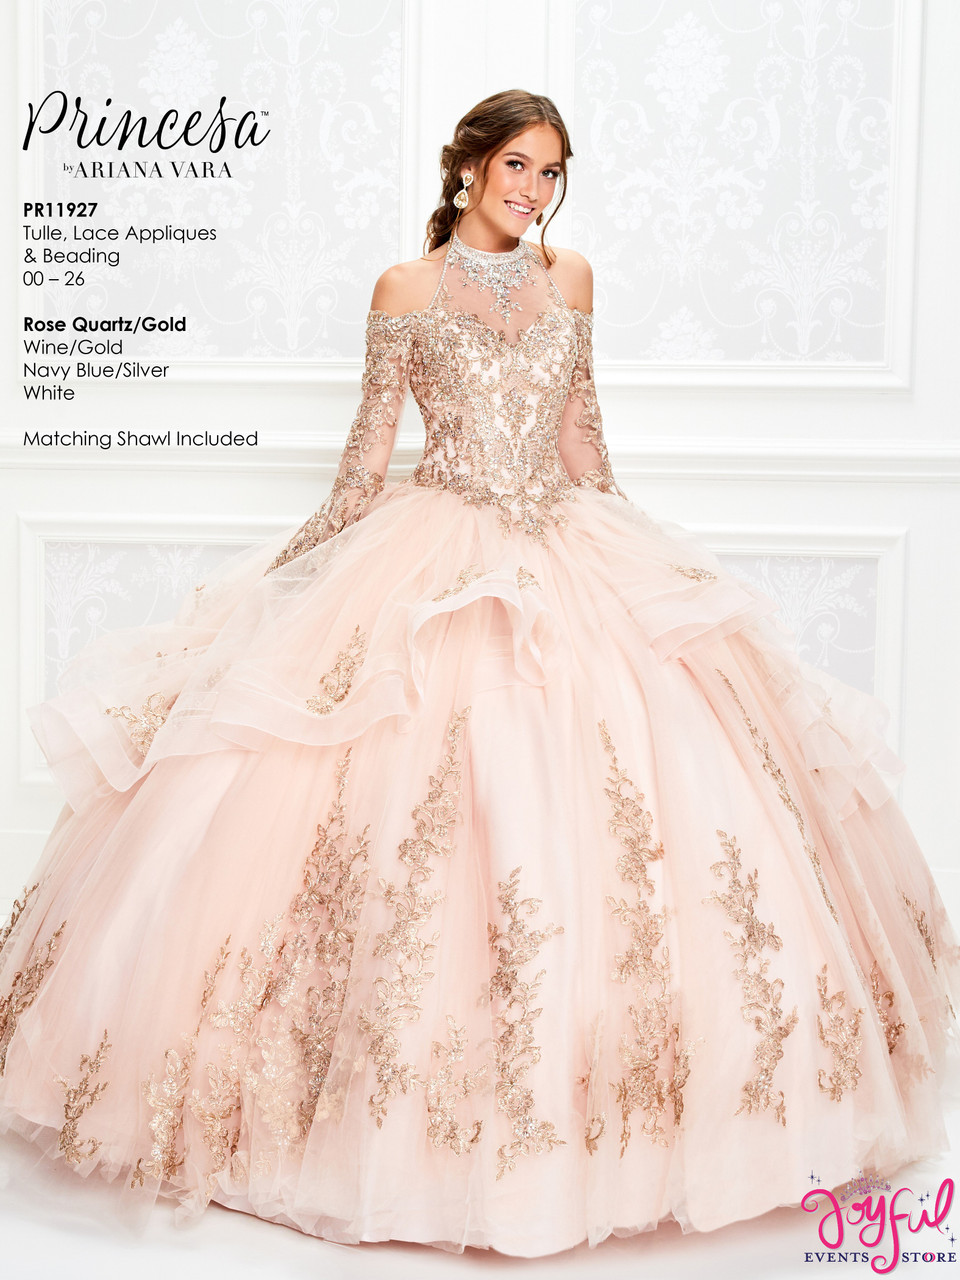 Rose Quartz Gold Quinceanera Dress Pr11927rq Joyful Events Store